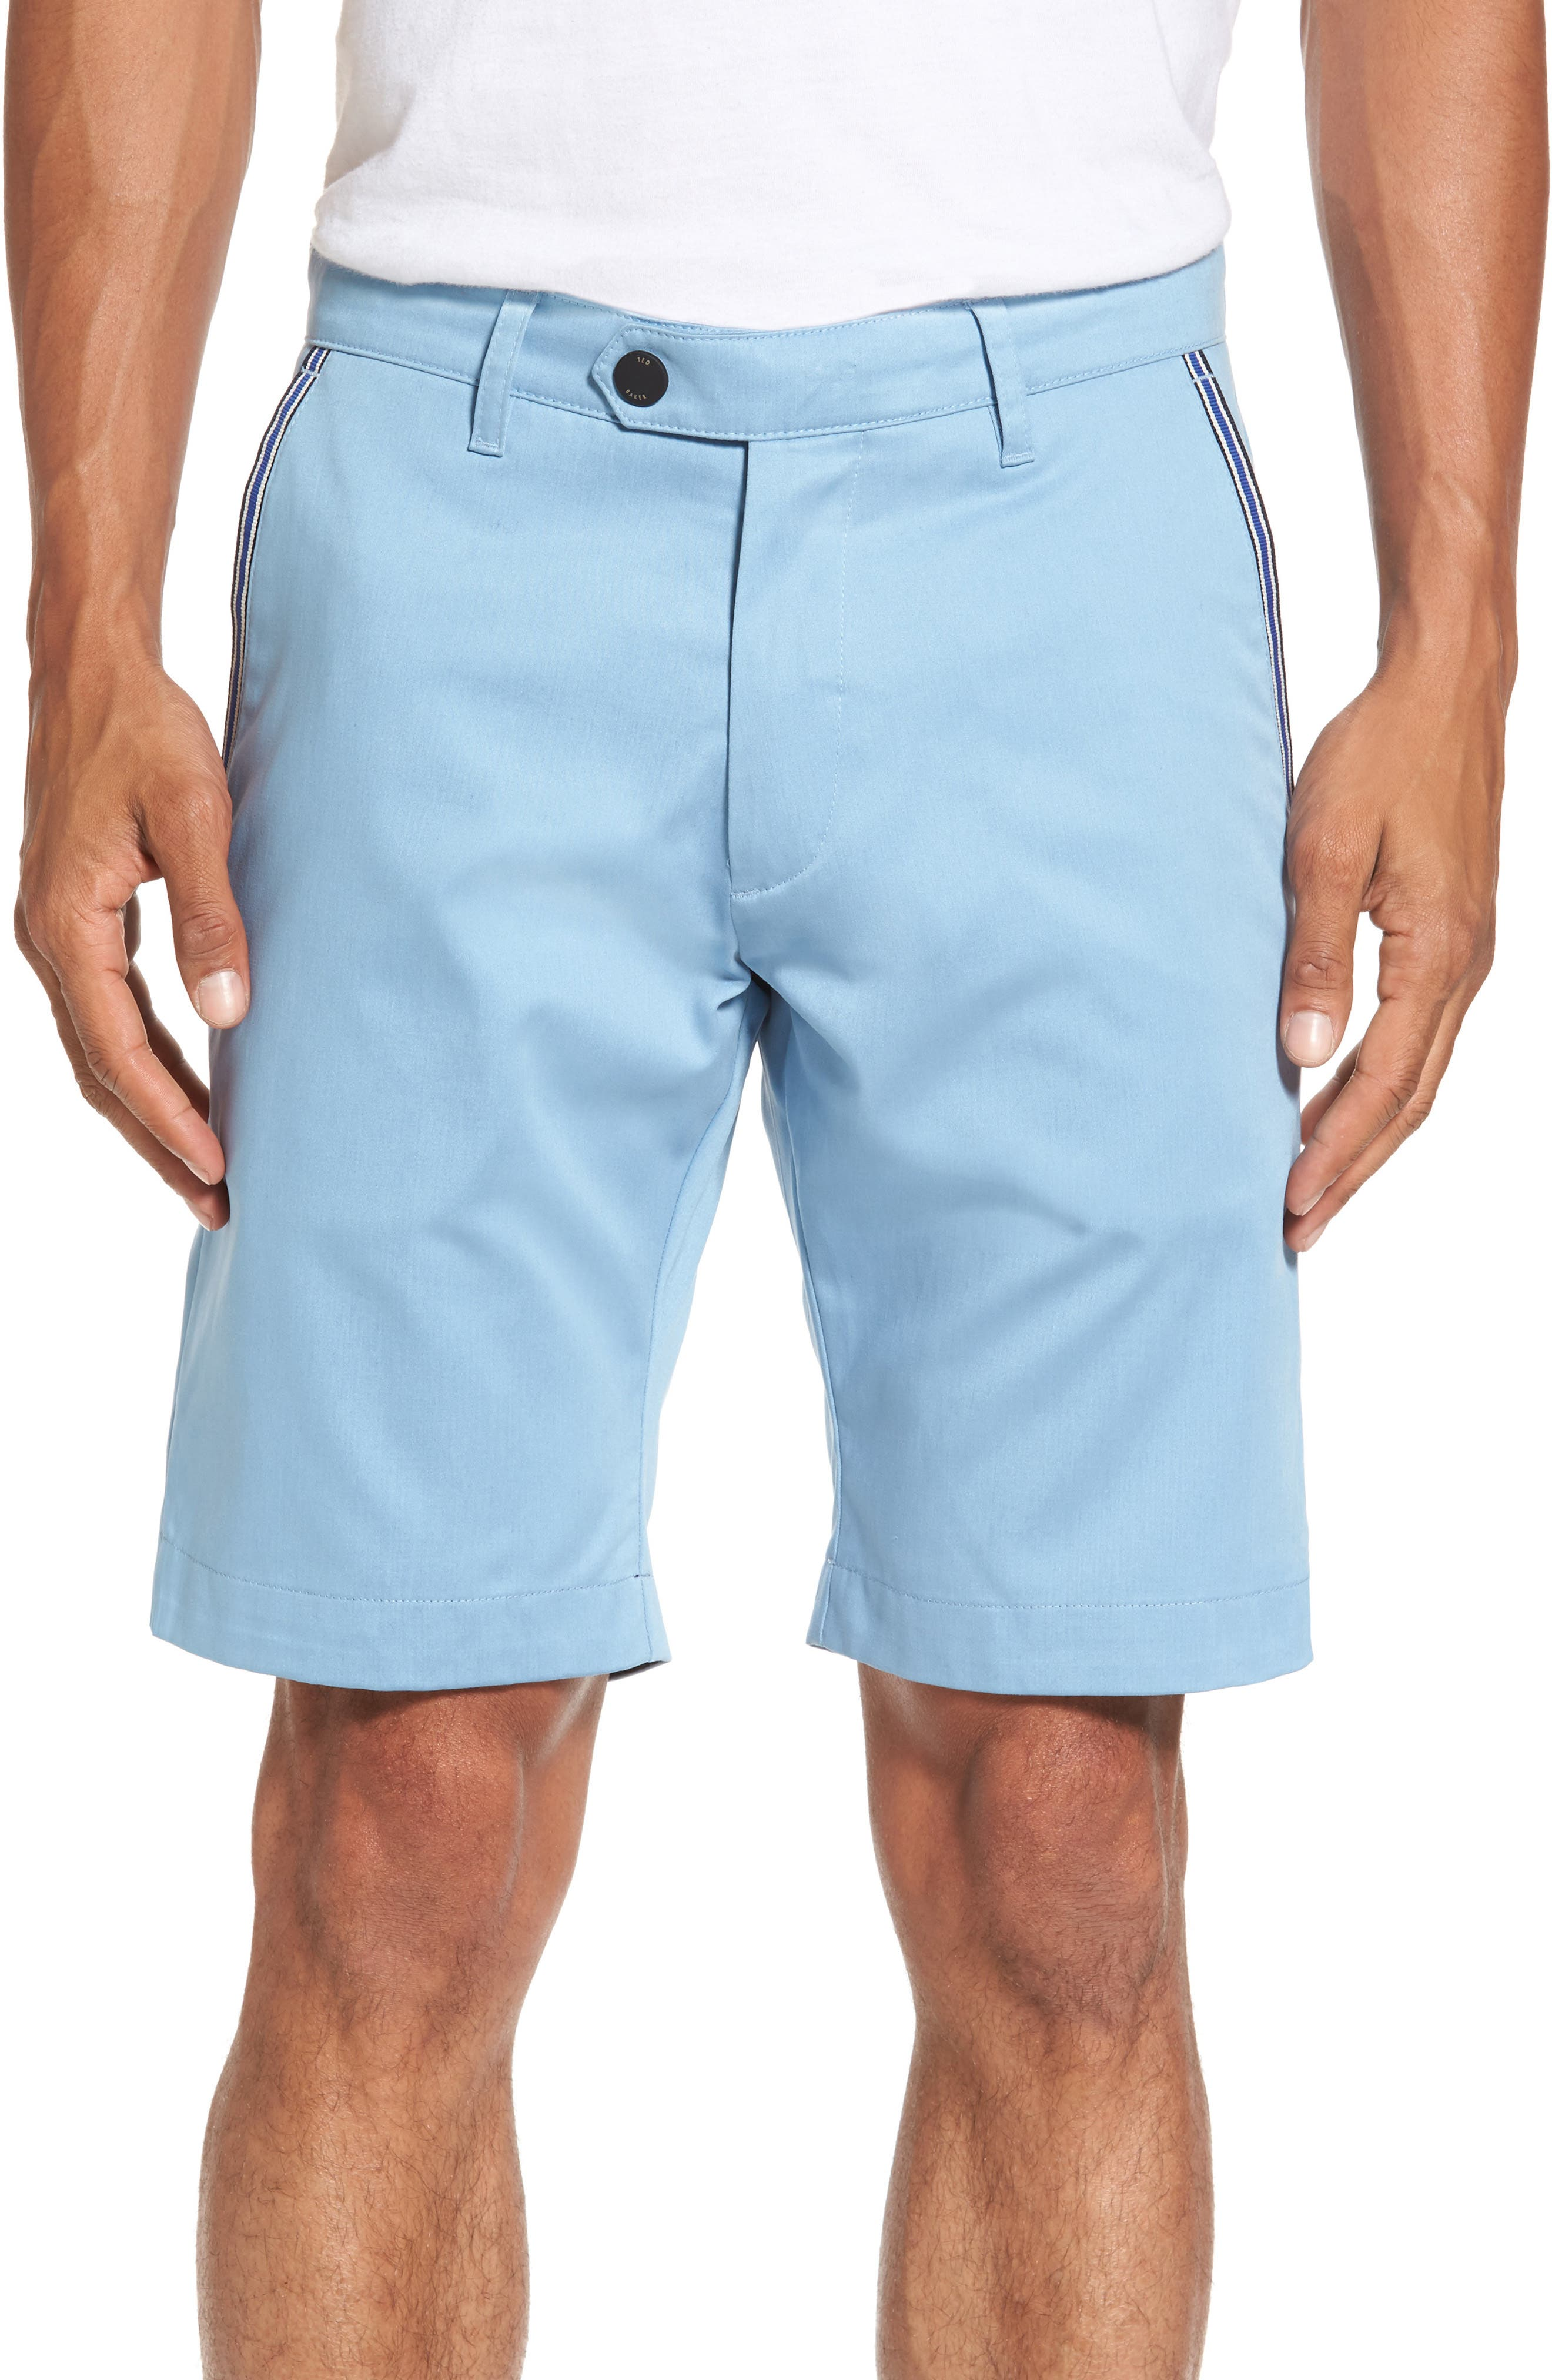 Alternate Image 1 Selected - Ted Baker London Golf Shorts